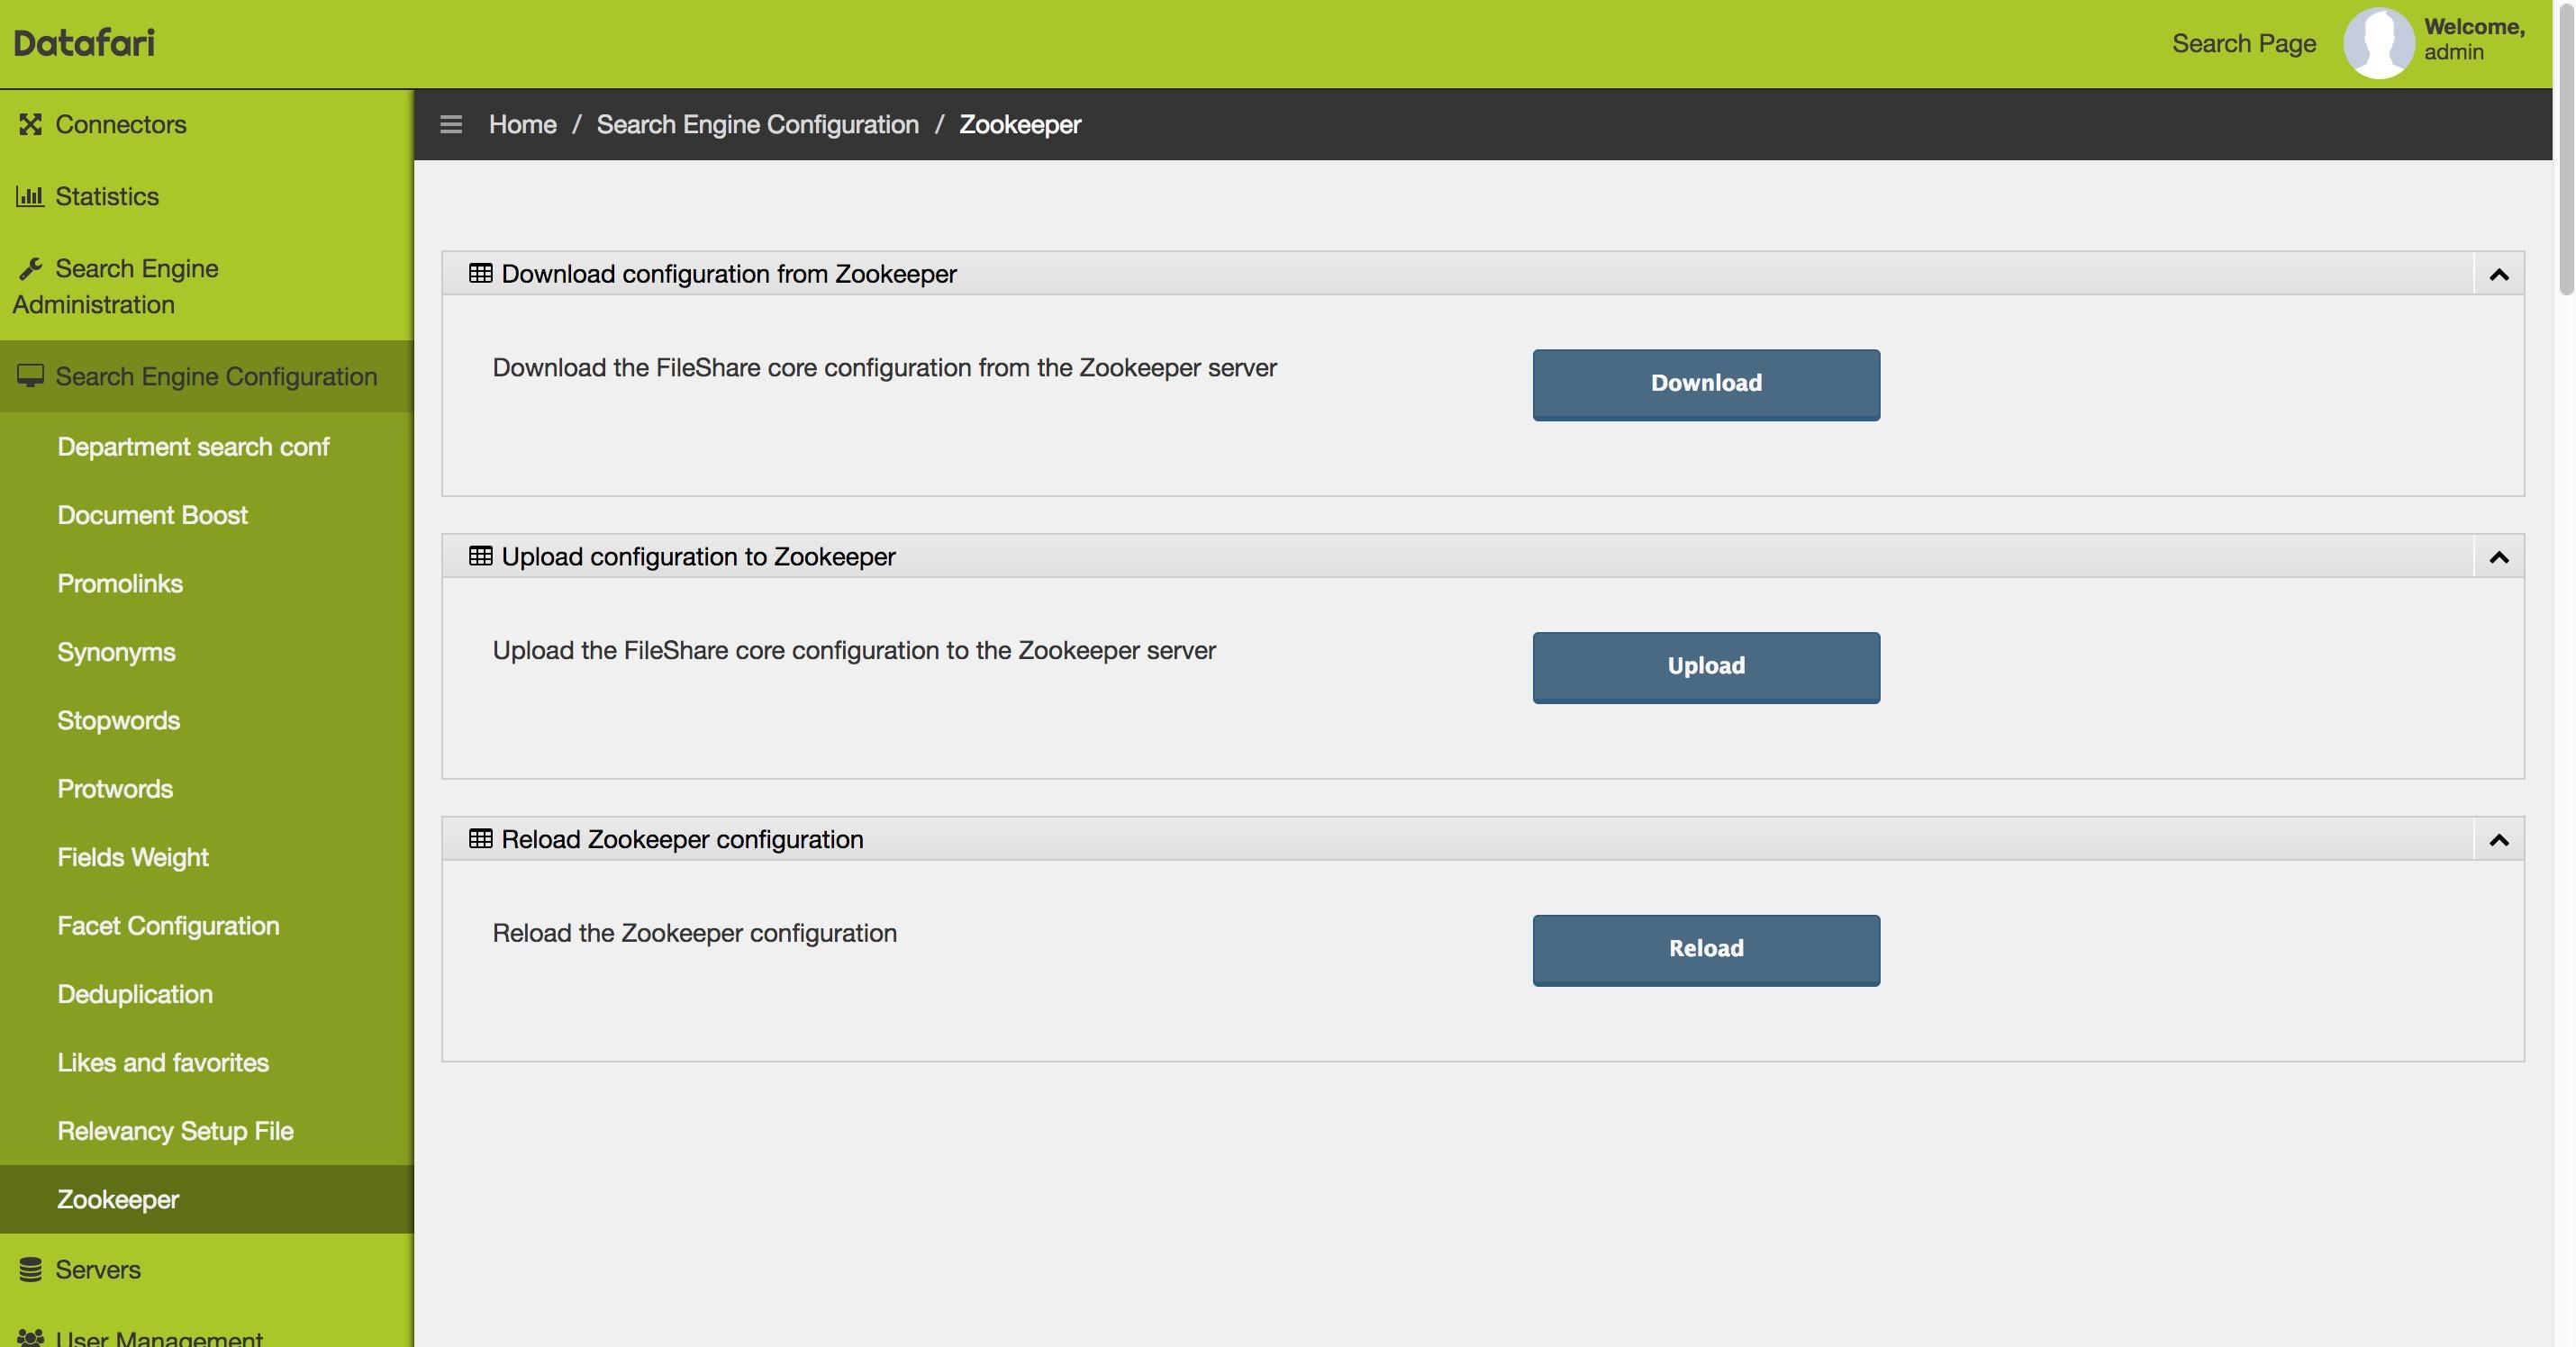 resume upload code in java